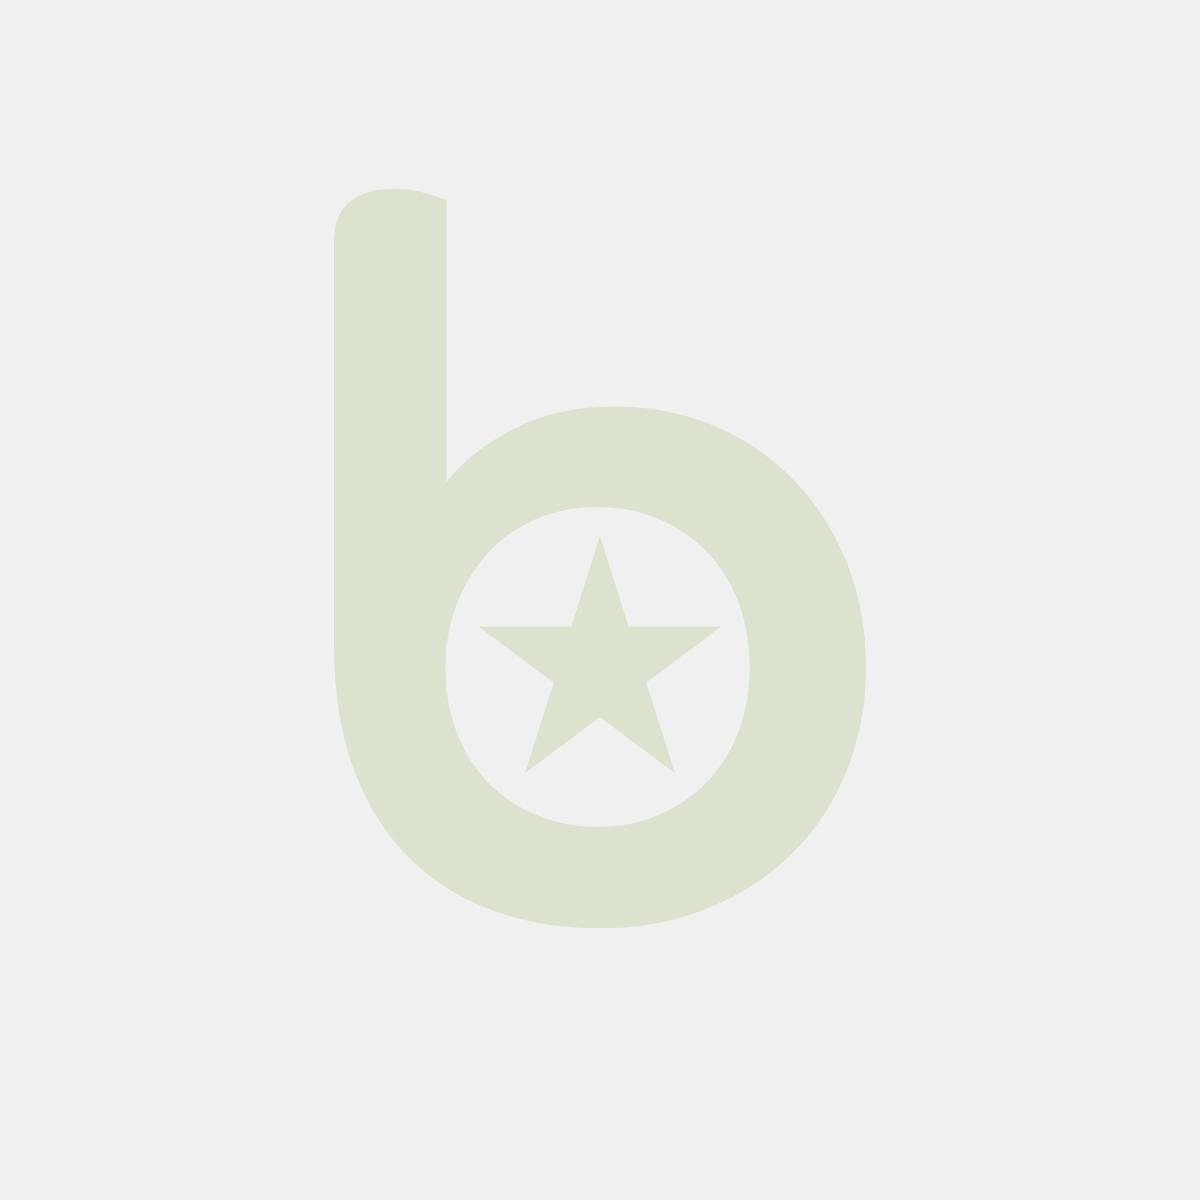 BePulp talerz kwadratowy 23x23x4cm naturalna trzcina cukrowa op. 75 sztuk